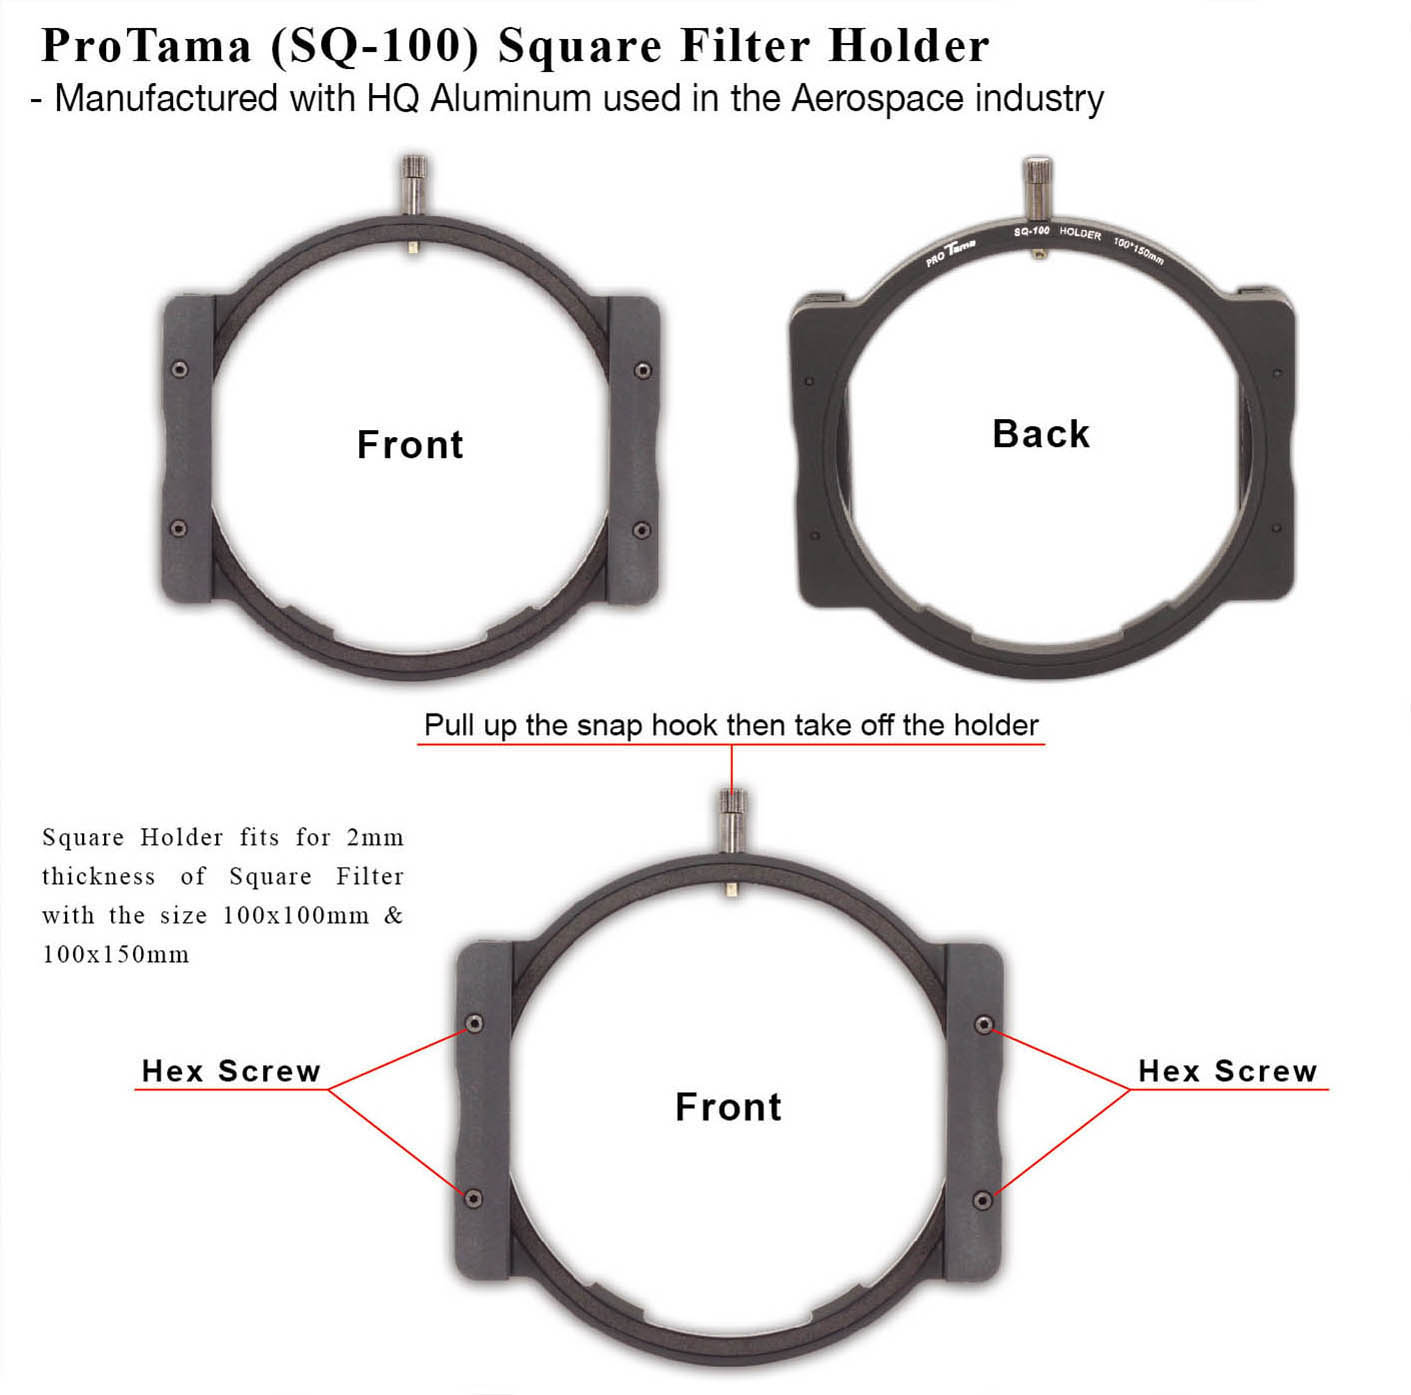 ProTama (SQ-100) Square Filter Holder (For 100x100/100x150mm) - Description